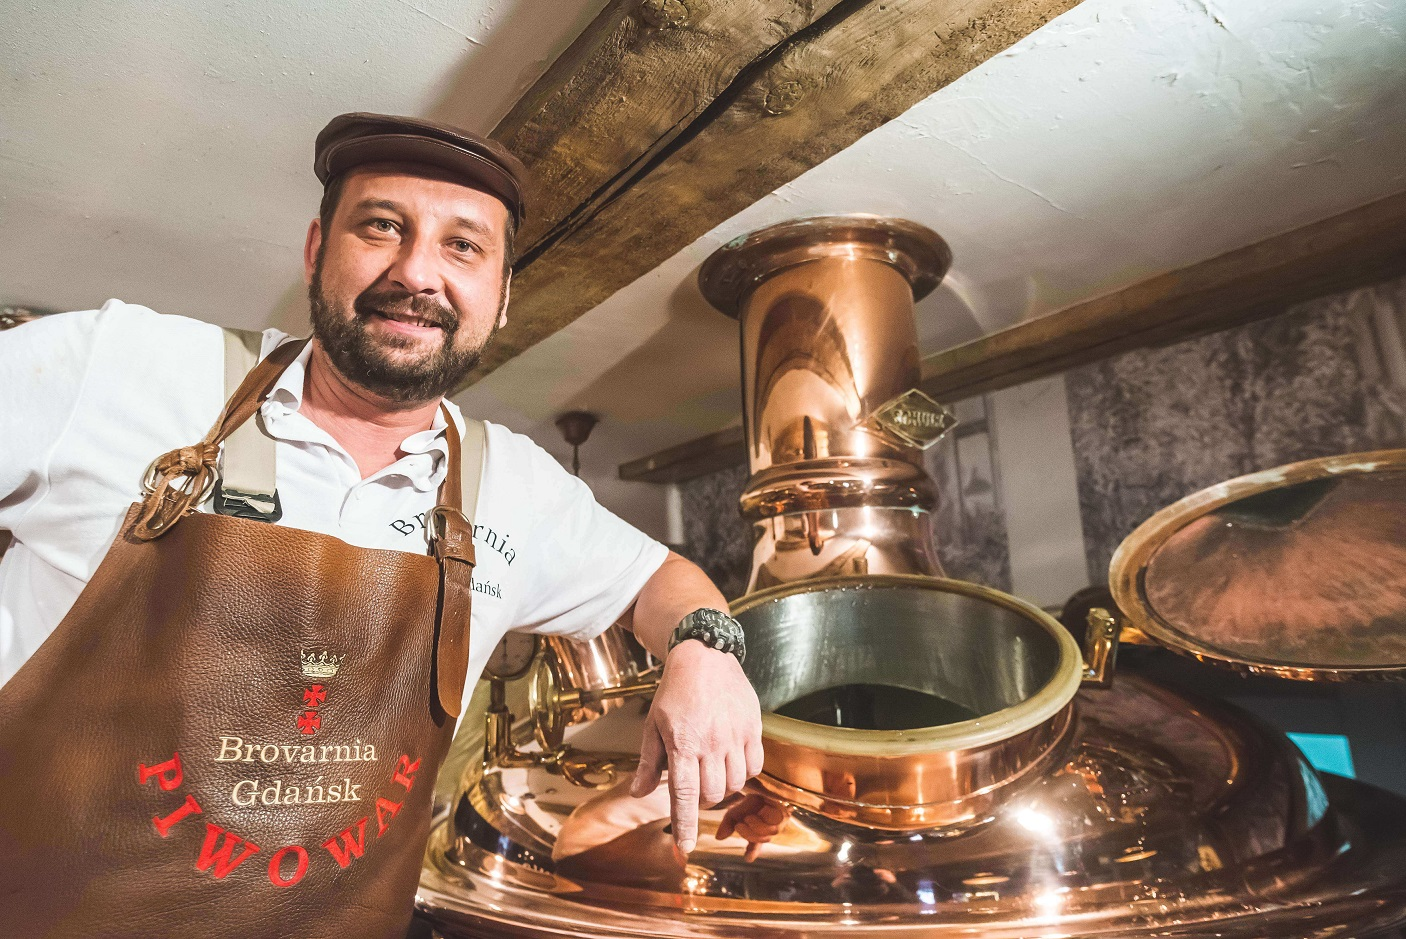 Brovarnia Gdańsk 3 - Pomorskie. A region teeming with traditional flavours